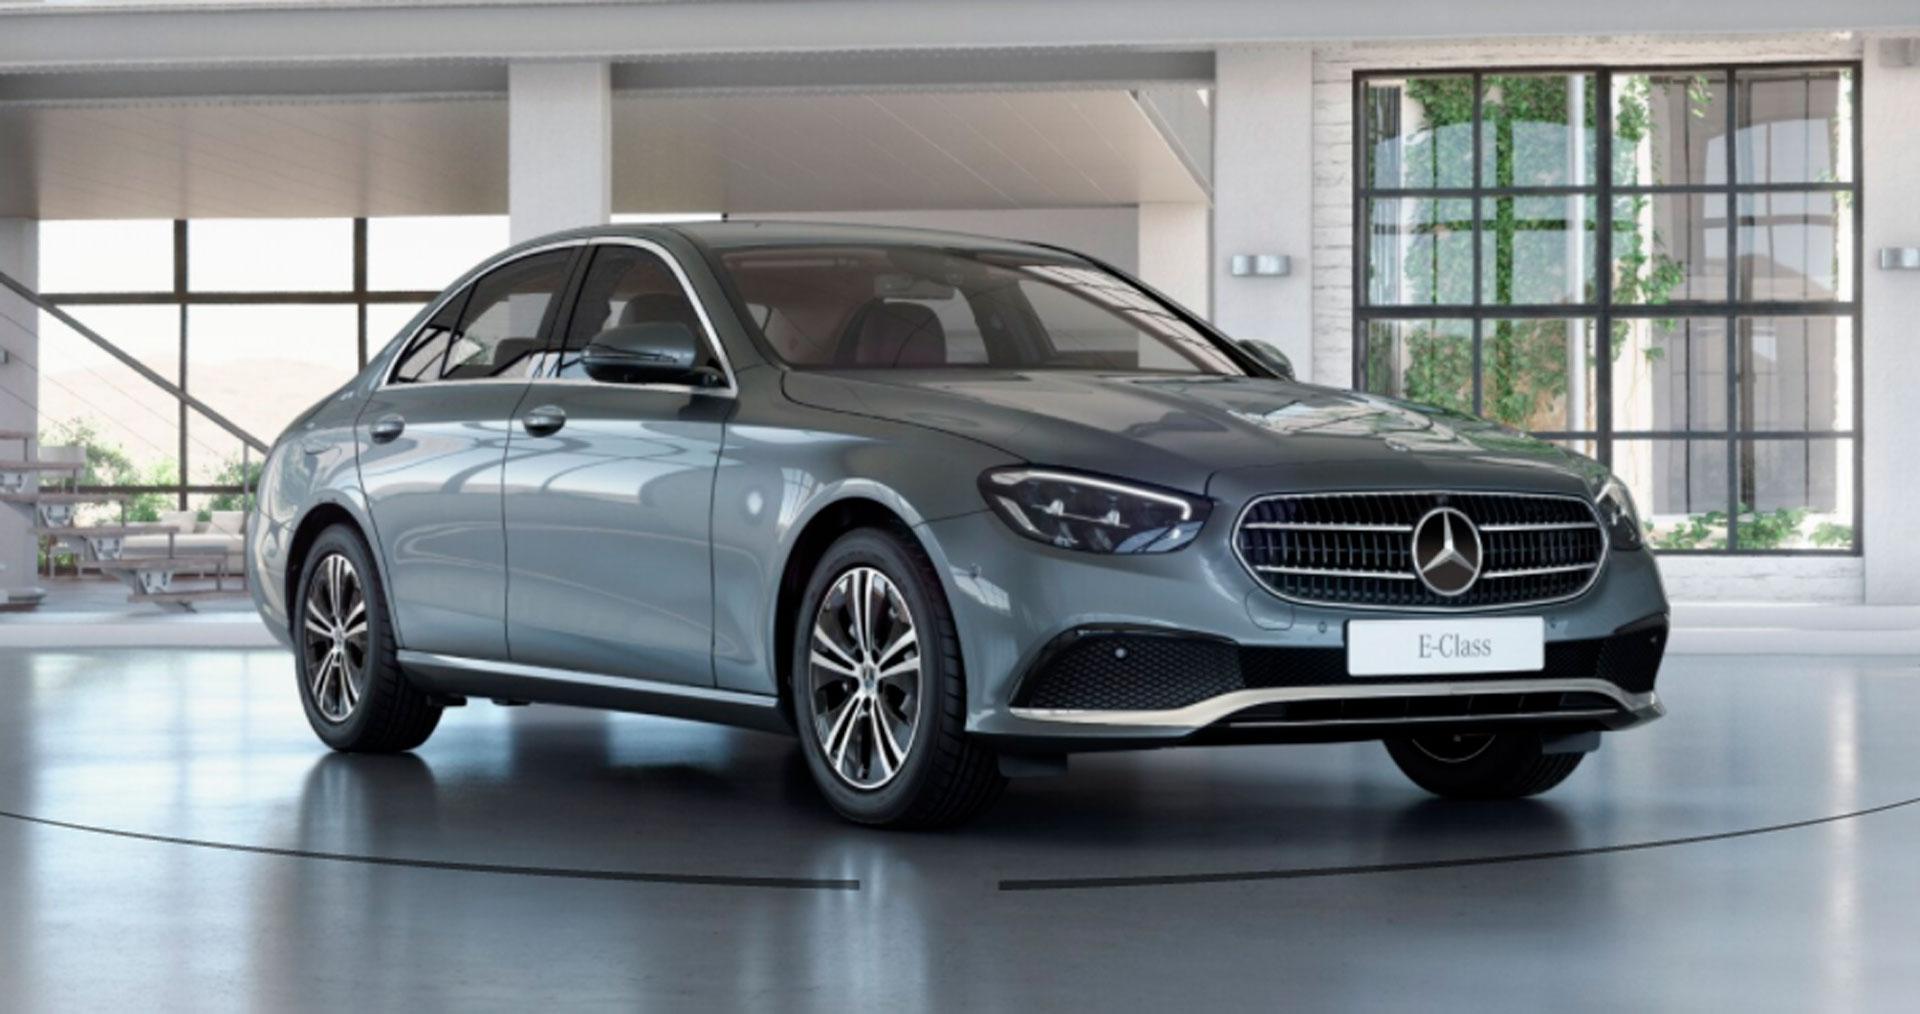 Mercedes-Benz E-Class Limousine 0152601371